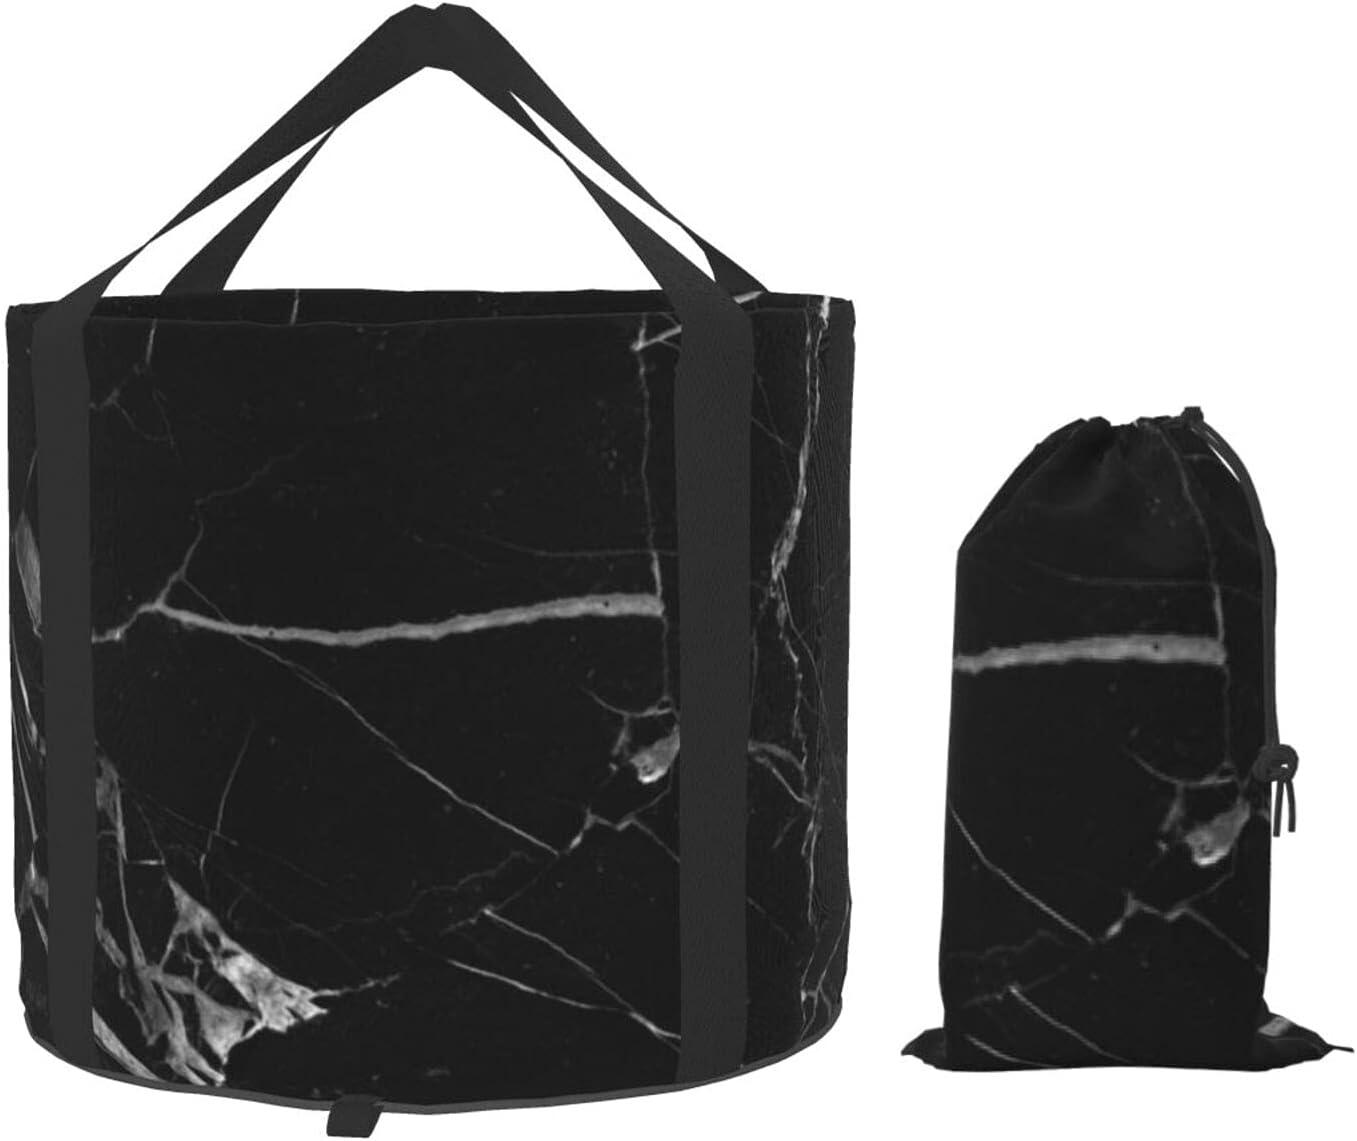 Foldable Bucket Multifunctional Washington Mall Portable Sales results No. 1 Folding Fishing